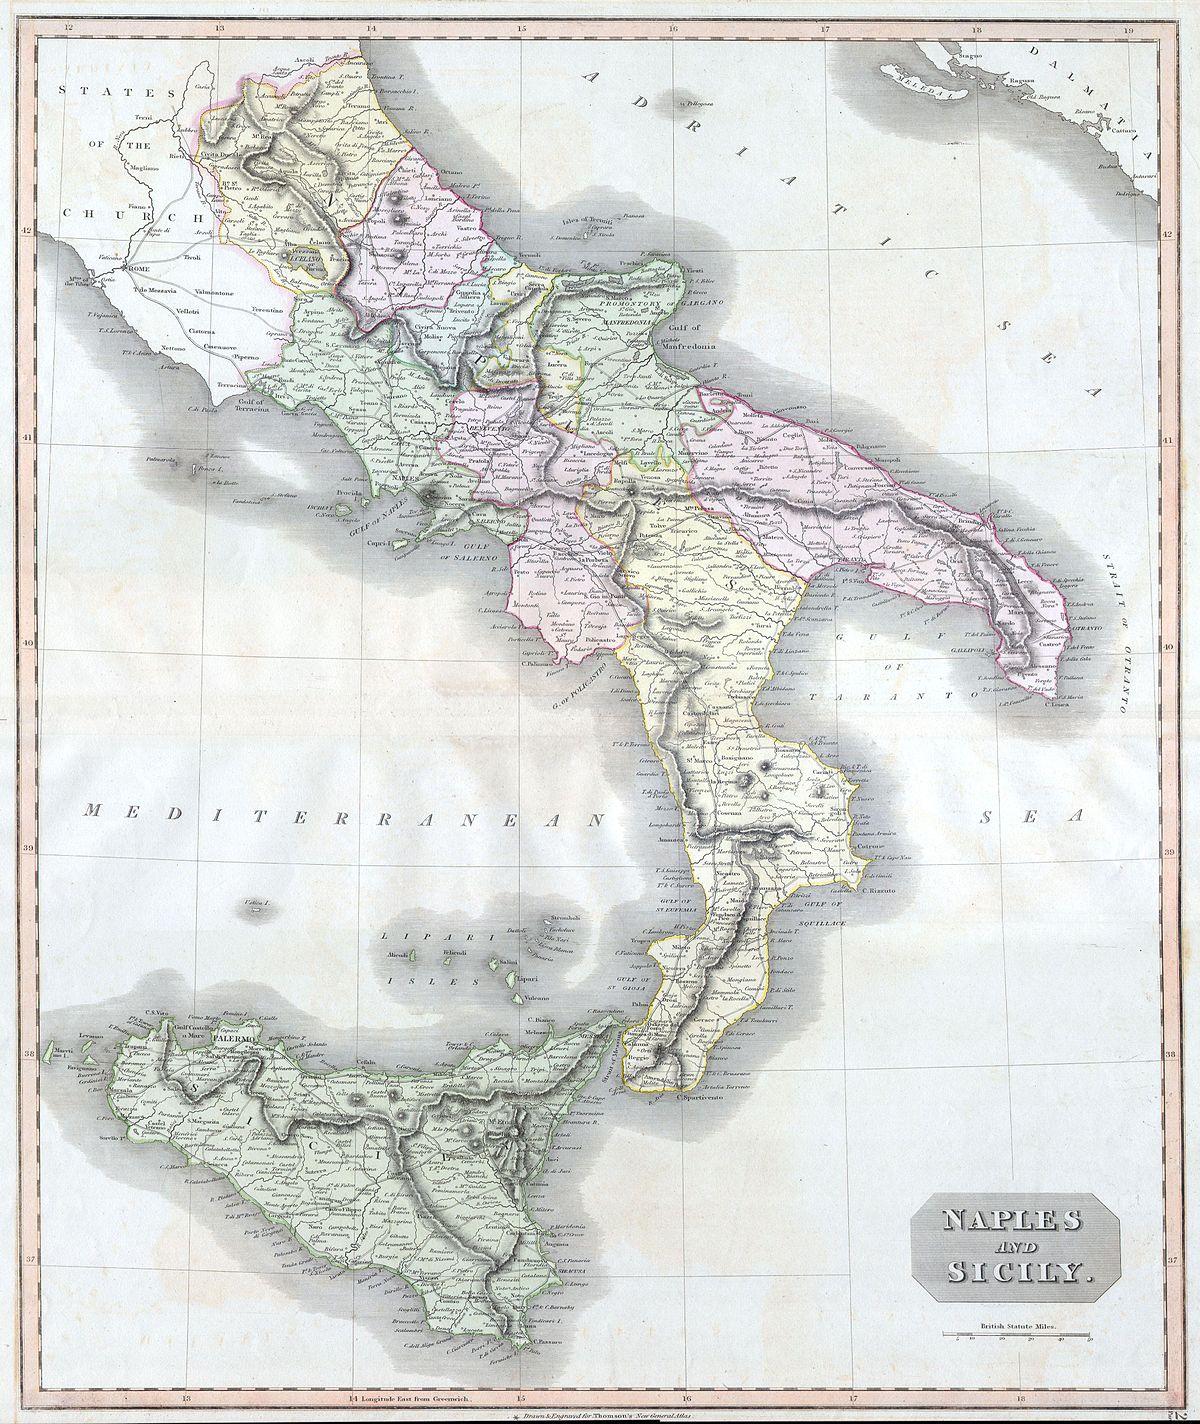 verbalone giurisprudenza catania italy map - photo#49